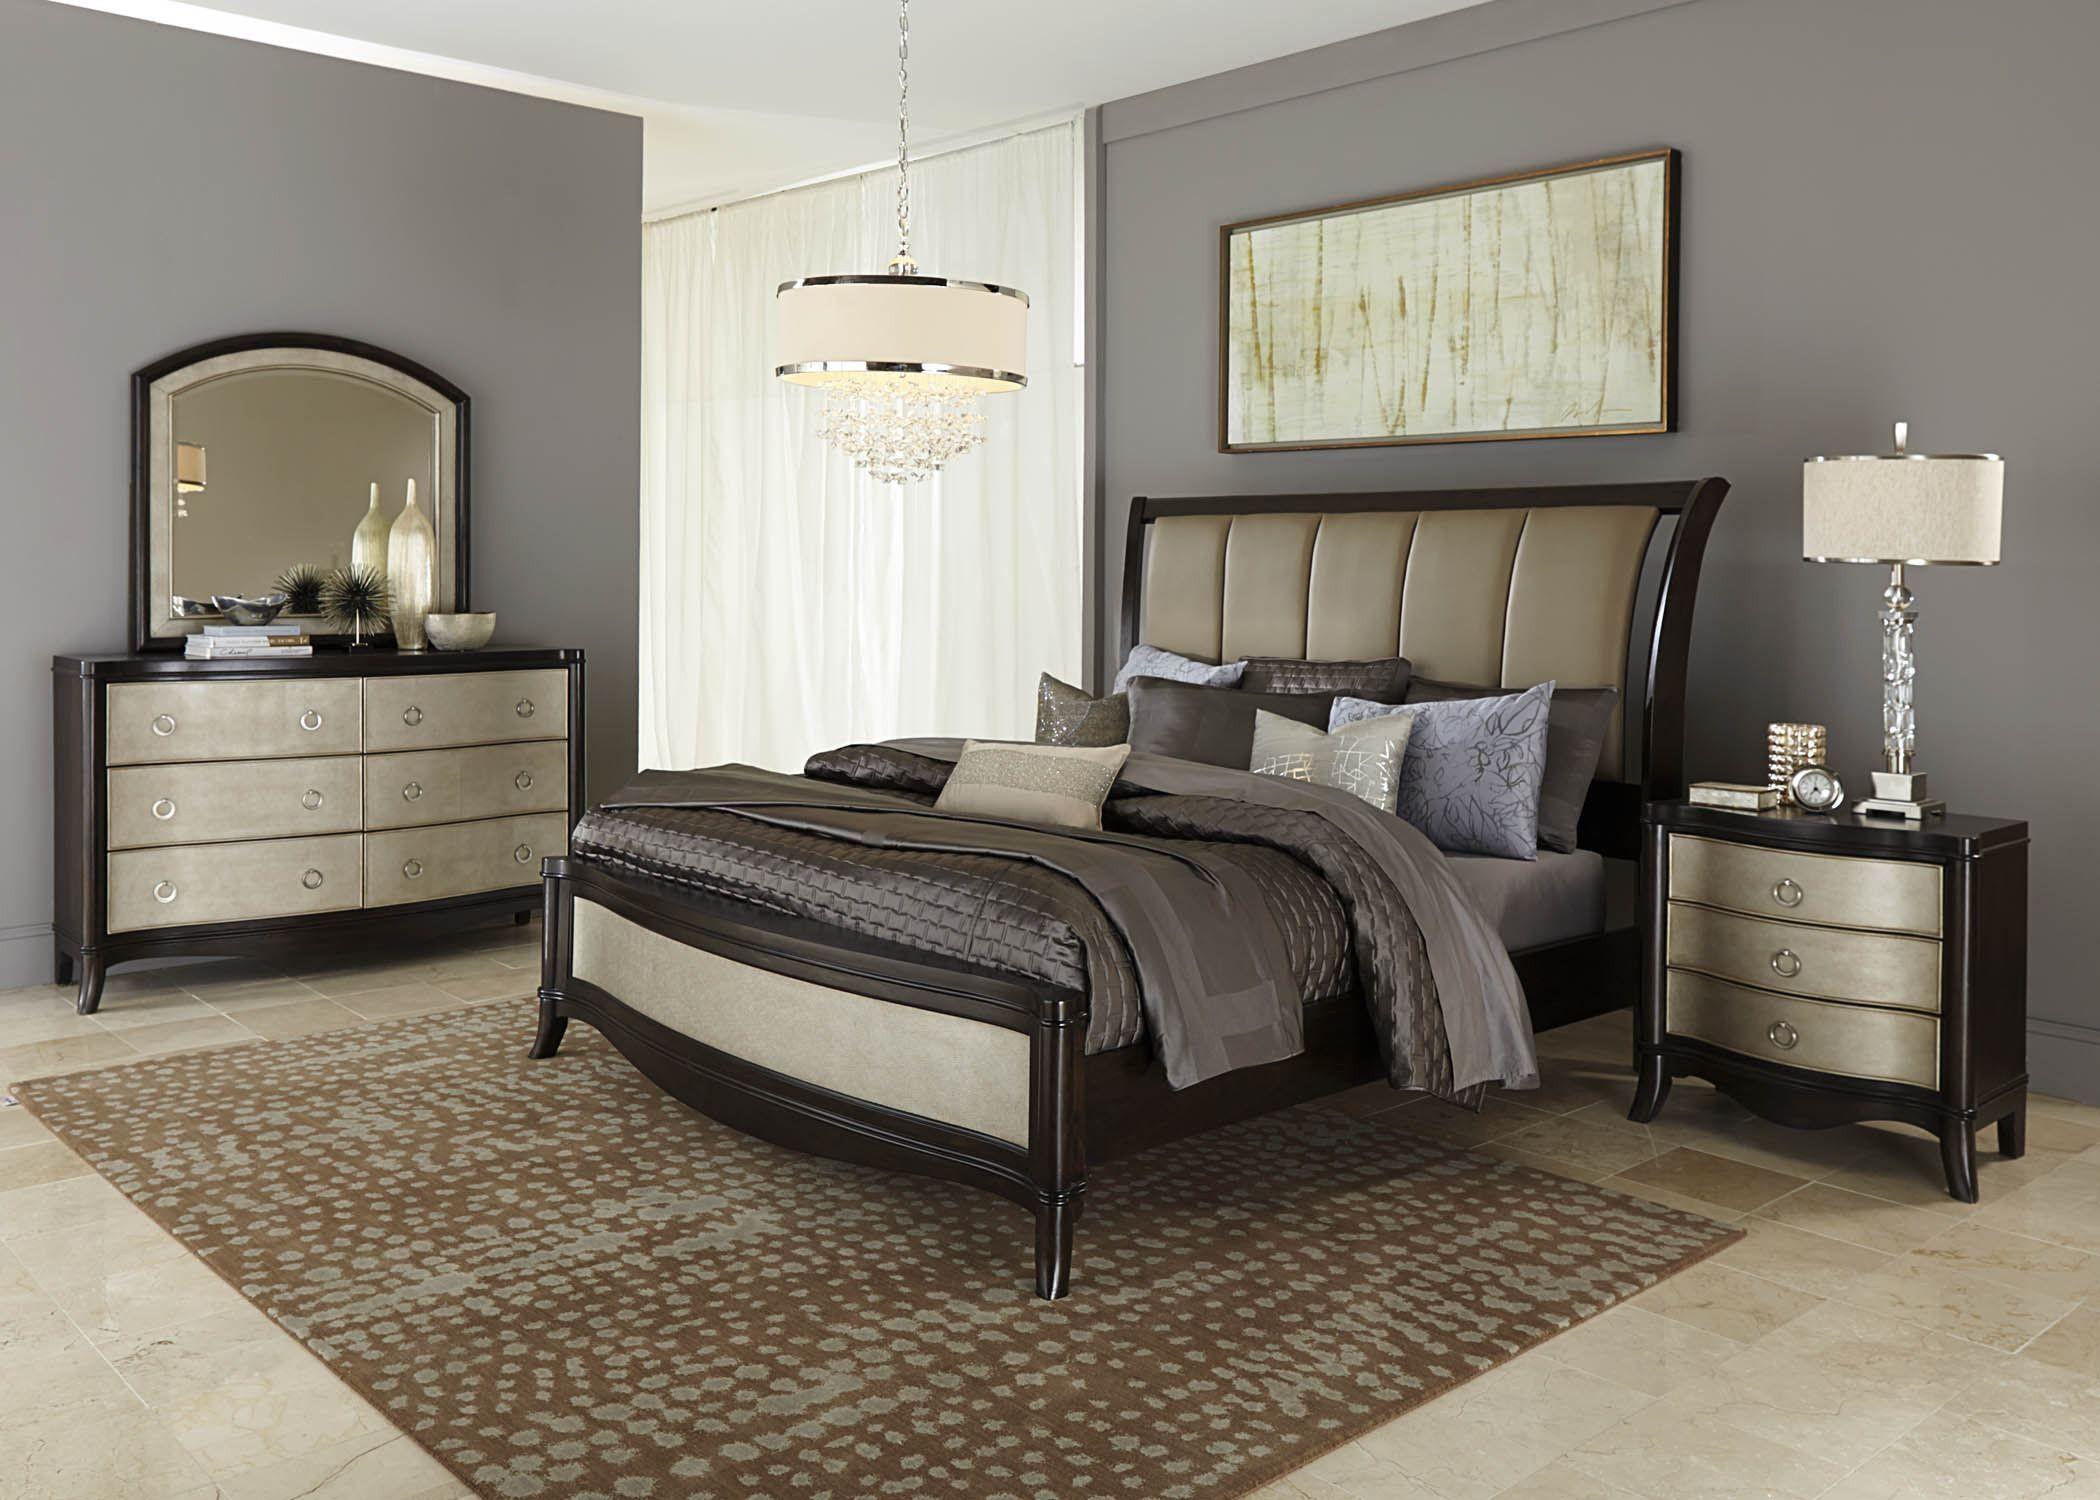 Permalink to Luxury Nebraska Furniture Mart Bedroom Sets Pics